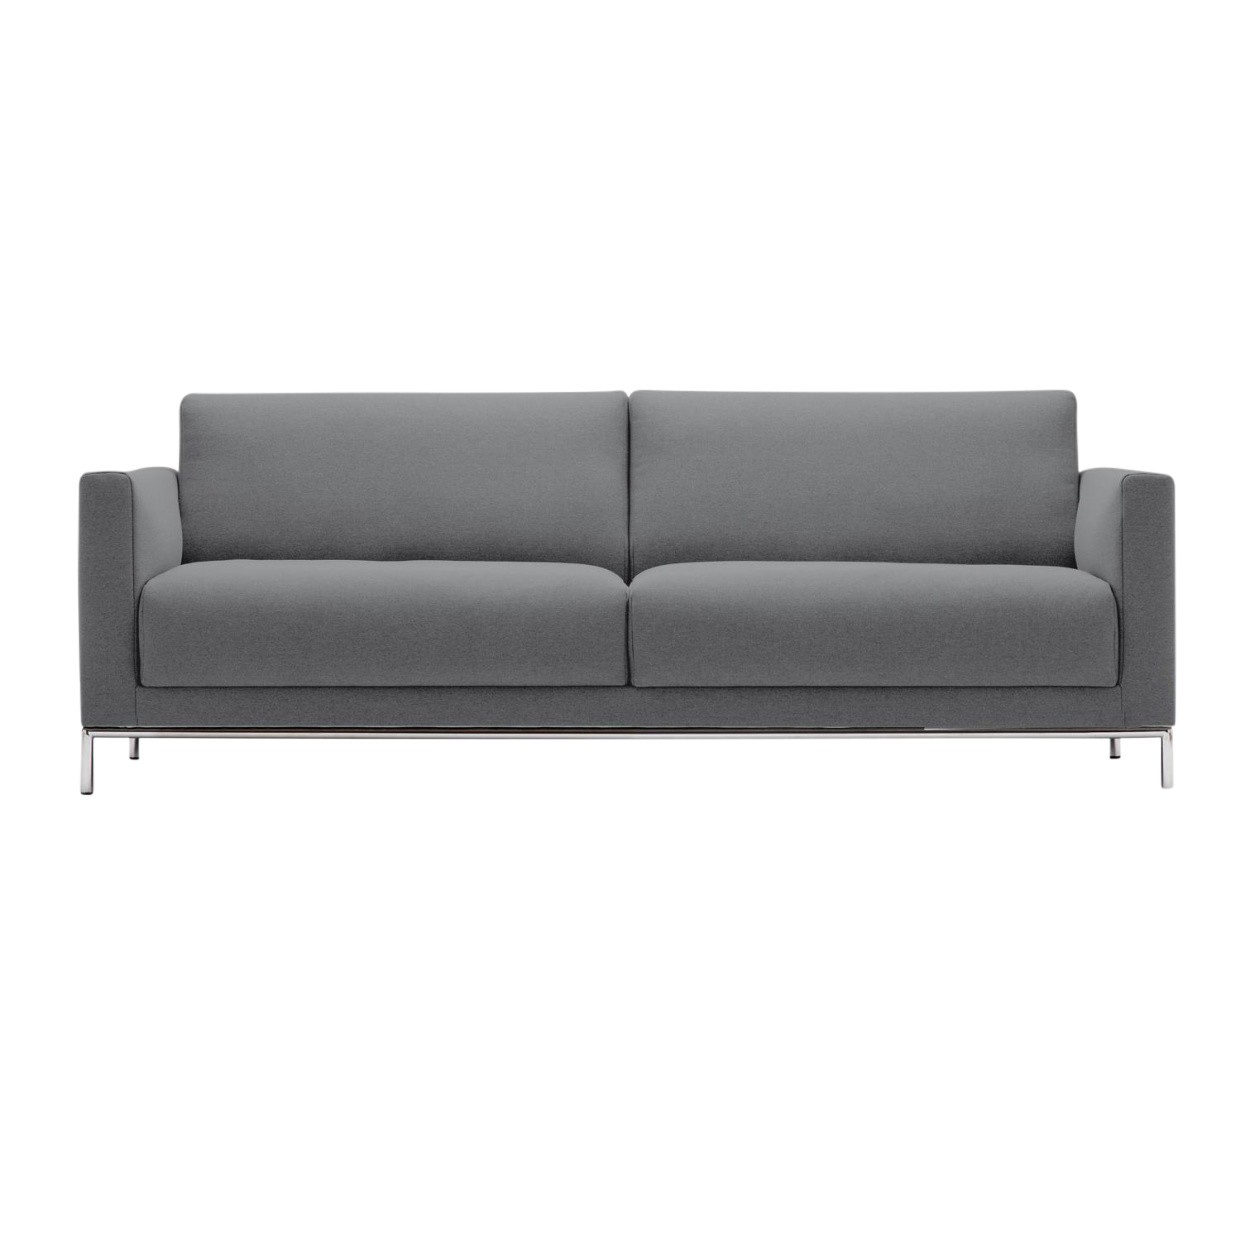 Full Size of Sofa 3 Sitzer Grau 3 Sitzer Nino Schwarz/grau Ikea Couch Retro Kingsley Louisiana (3 Sitzer Mit Polster Grau) 2 Und Rattan Leder Schlaffunktion Samt Freistil Sofa Sofa 3 Sitzer Grau